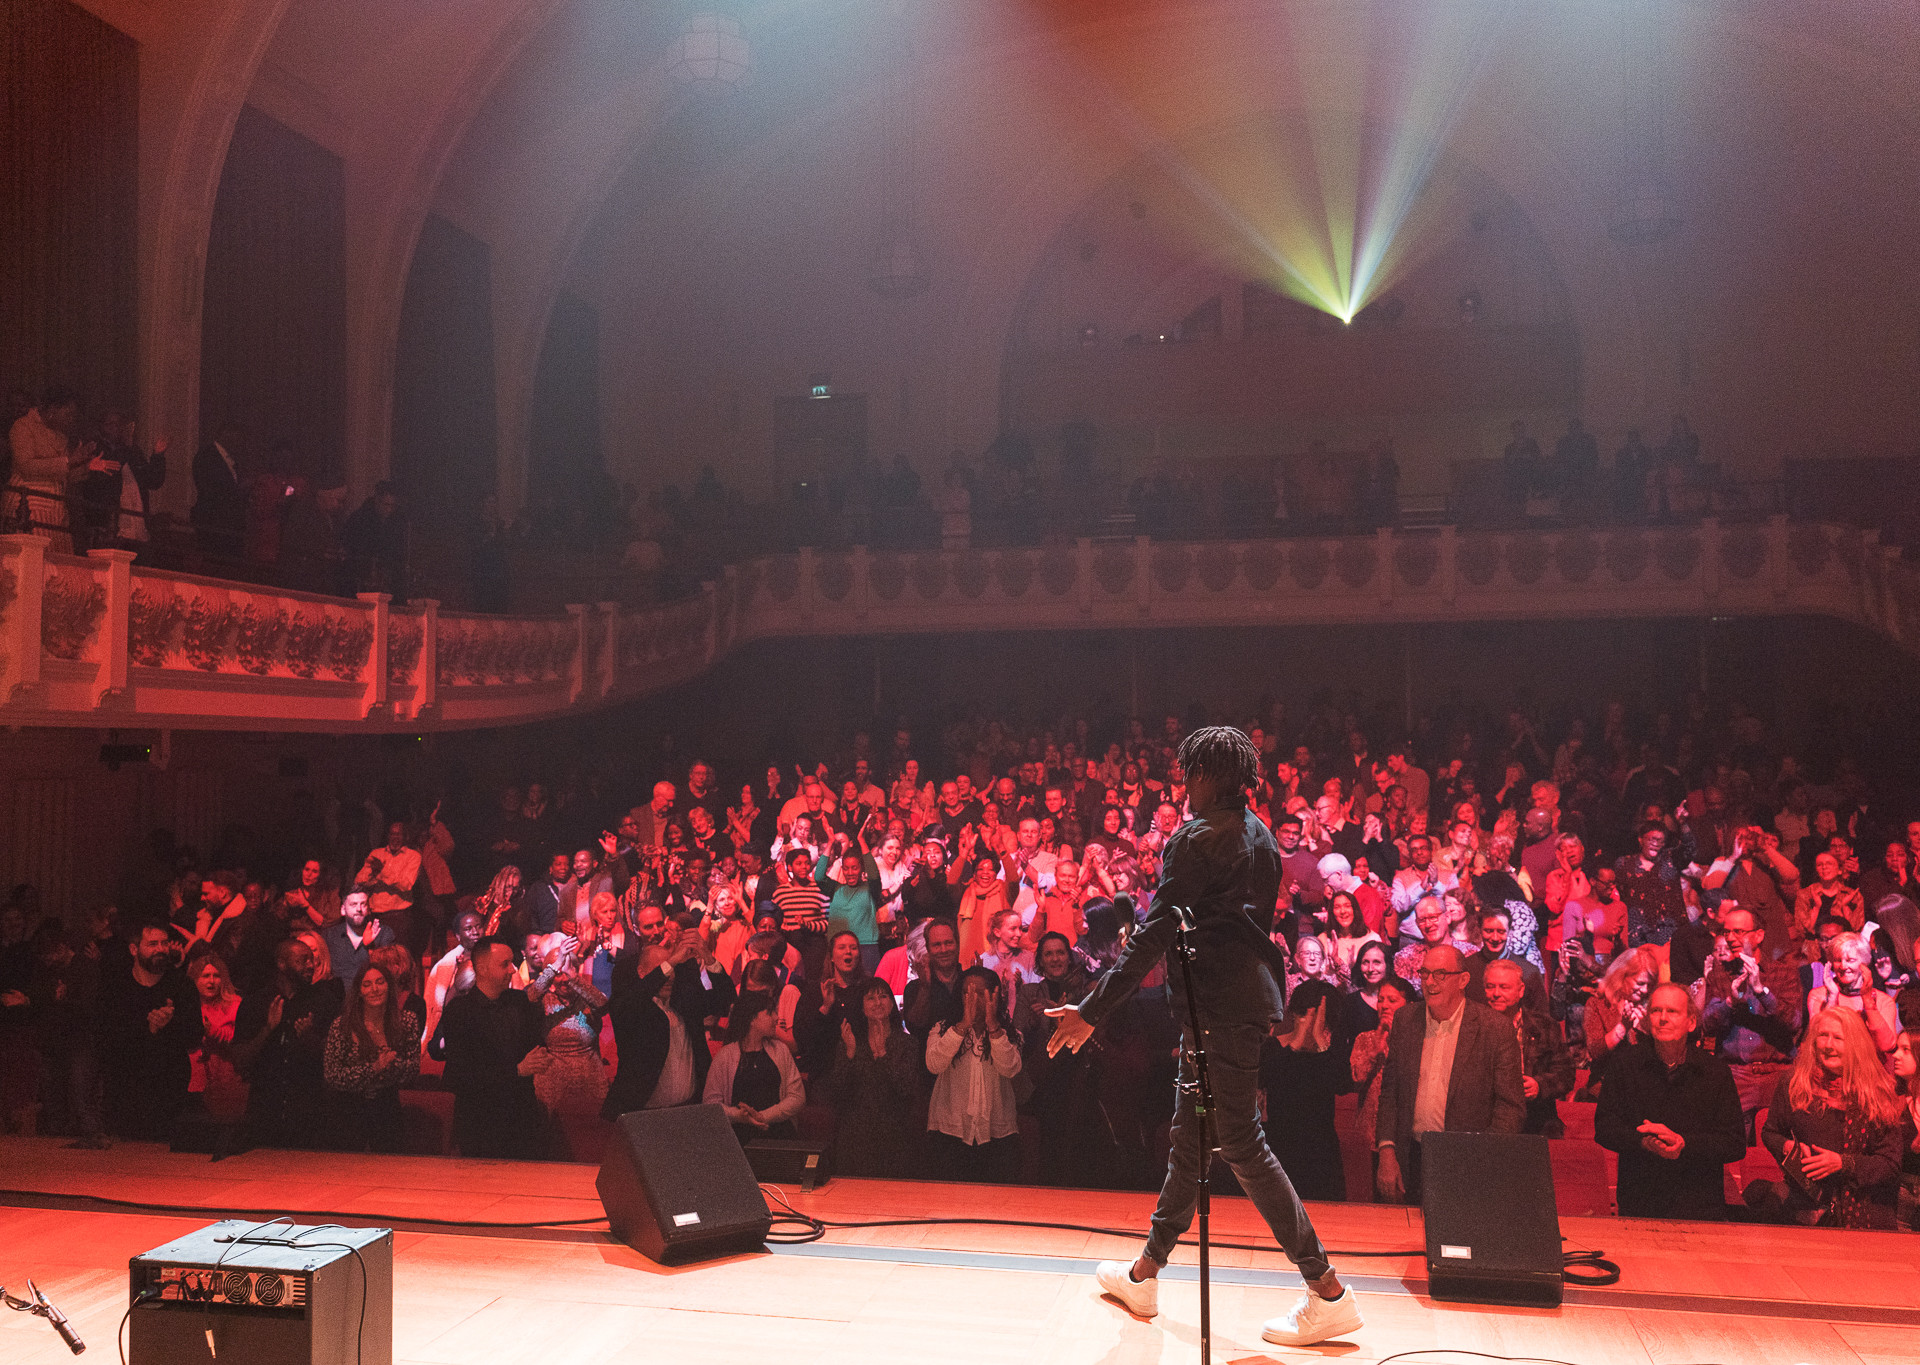 202_Drake_Yolanda_Winter_Concert_220220.